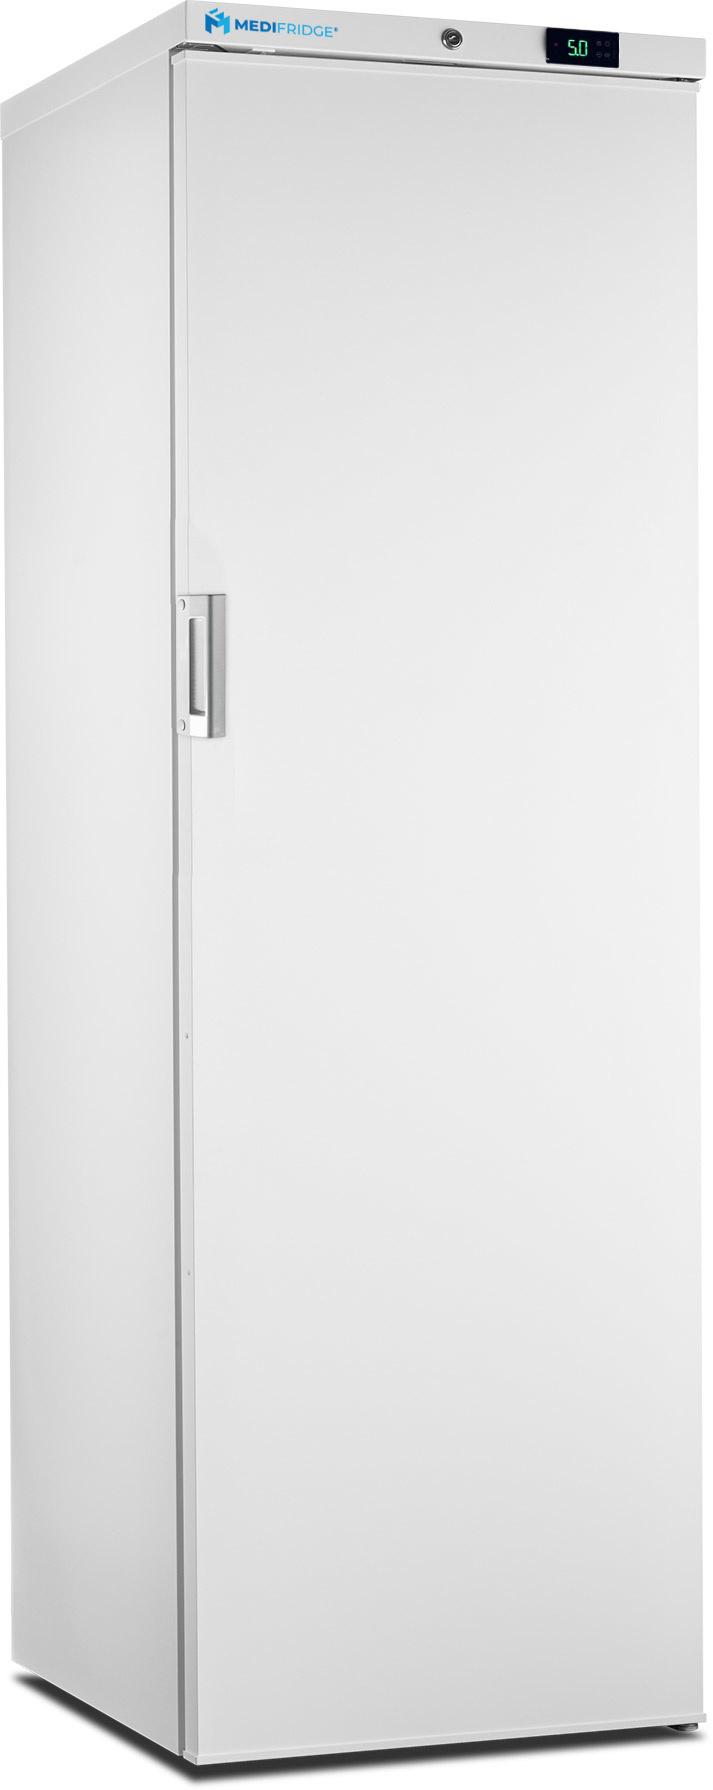 MediFridge medicine refrigerator MF450L-CD - Closed door - 416 liters - 600x700x1875 mm - DIN 58345